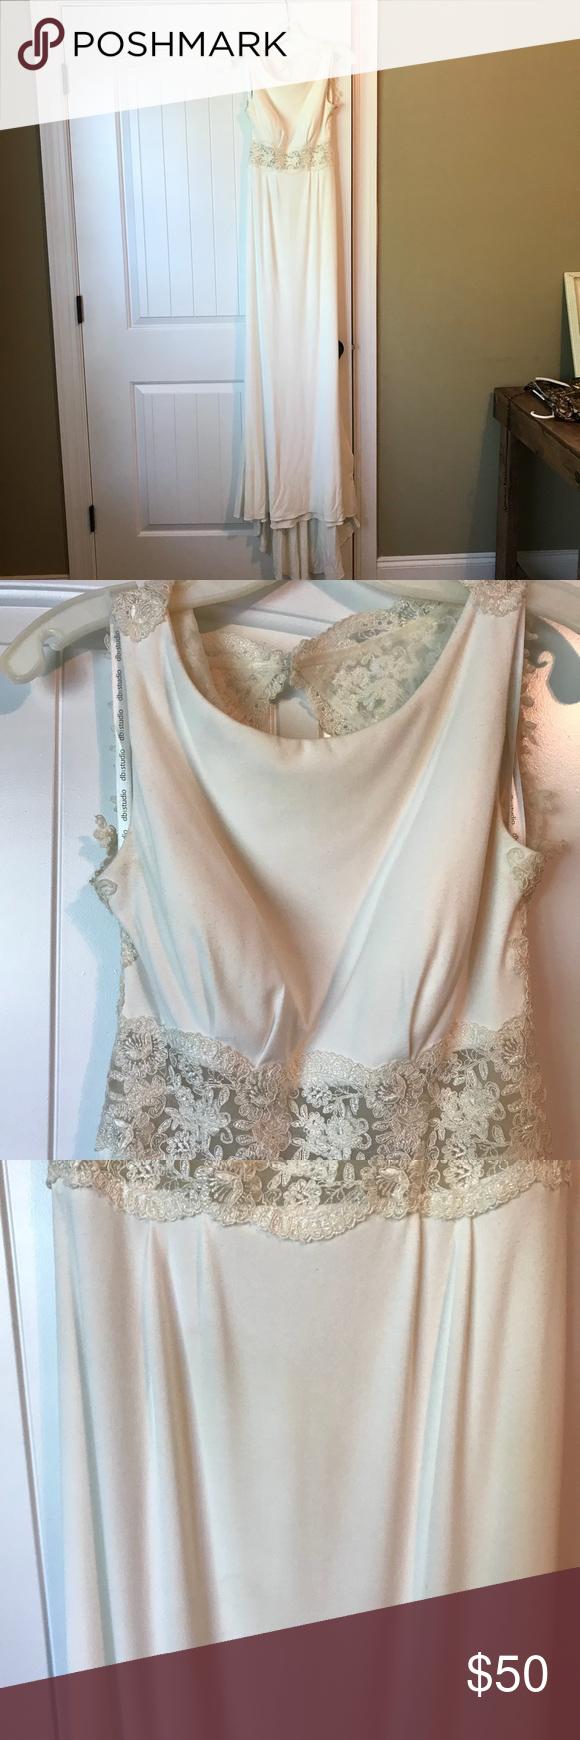 Wedding dress dry cleaning near me  Wedding Dress Dress worn with slight spray tan stains on dress